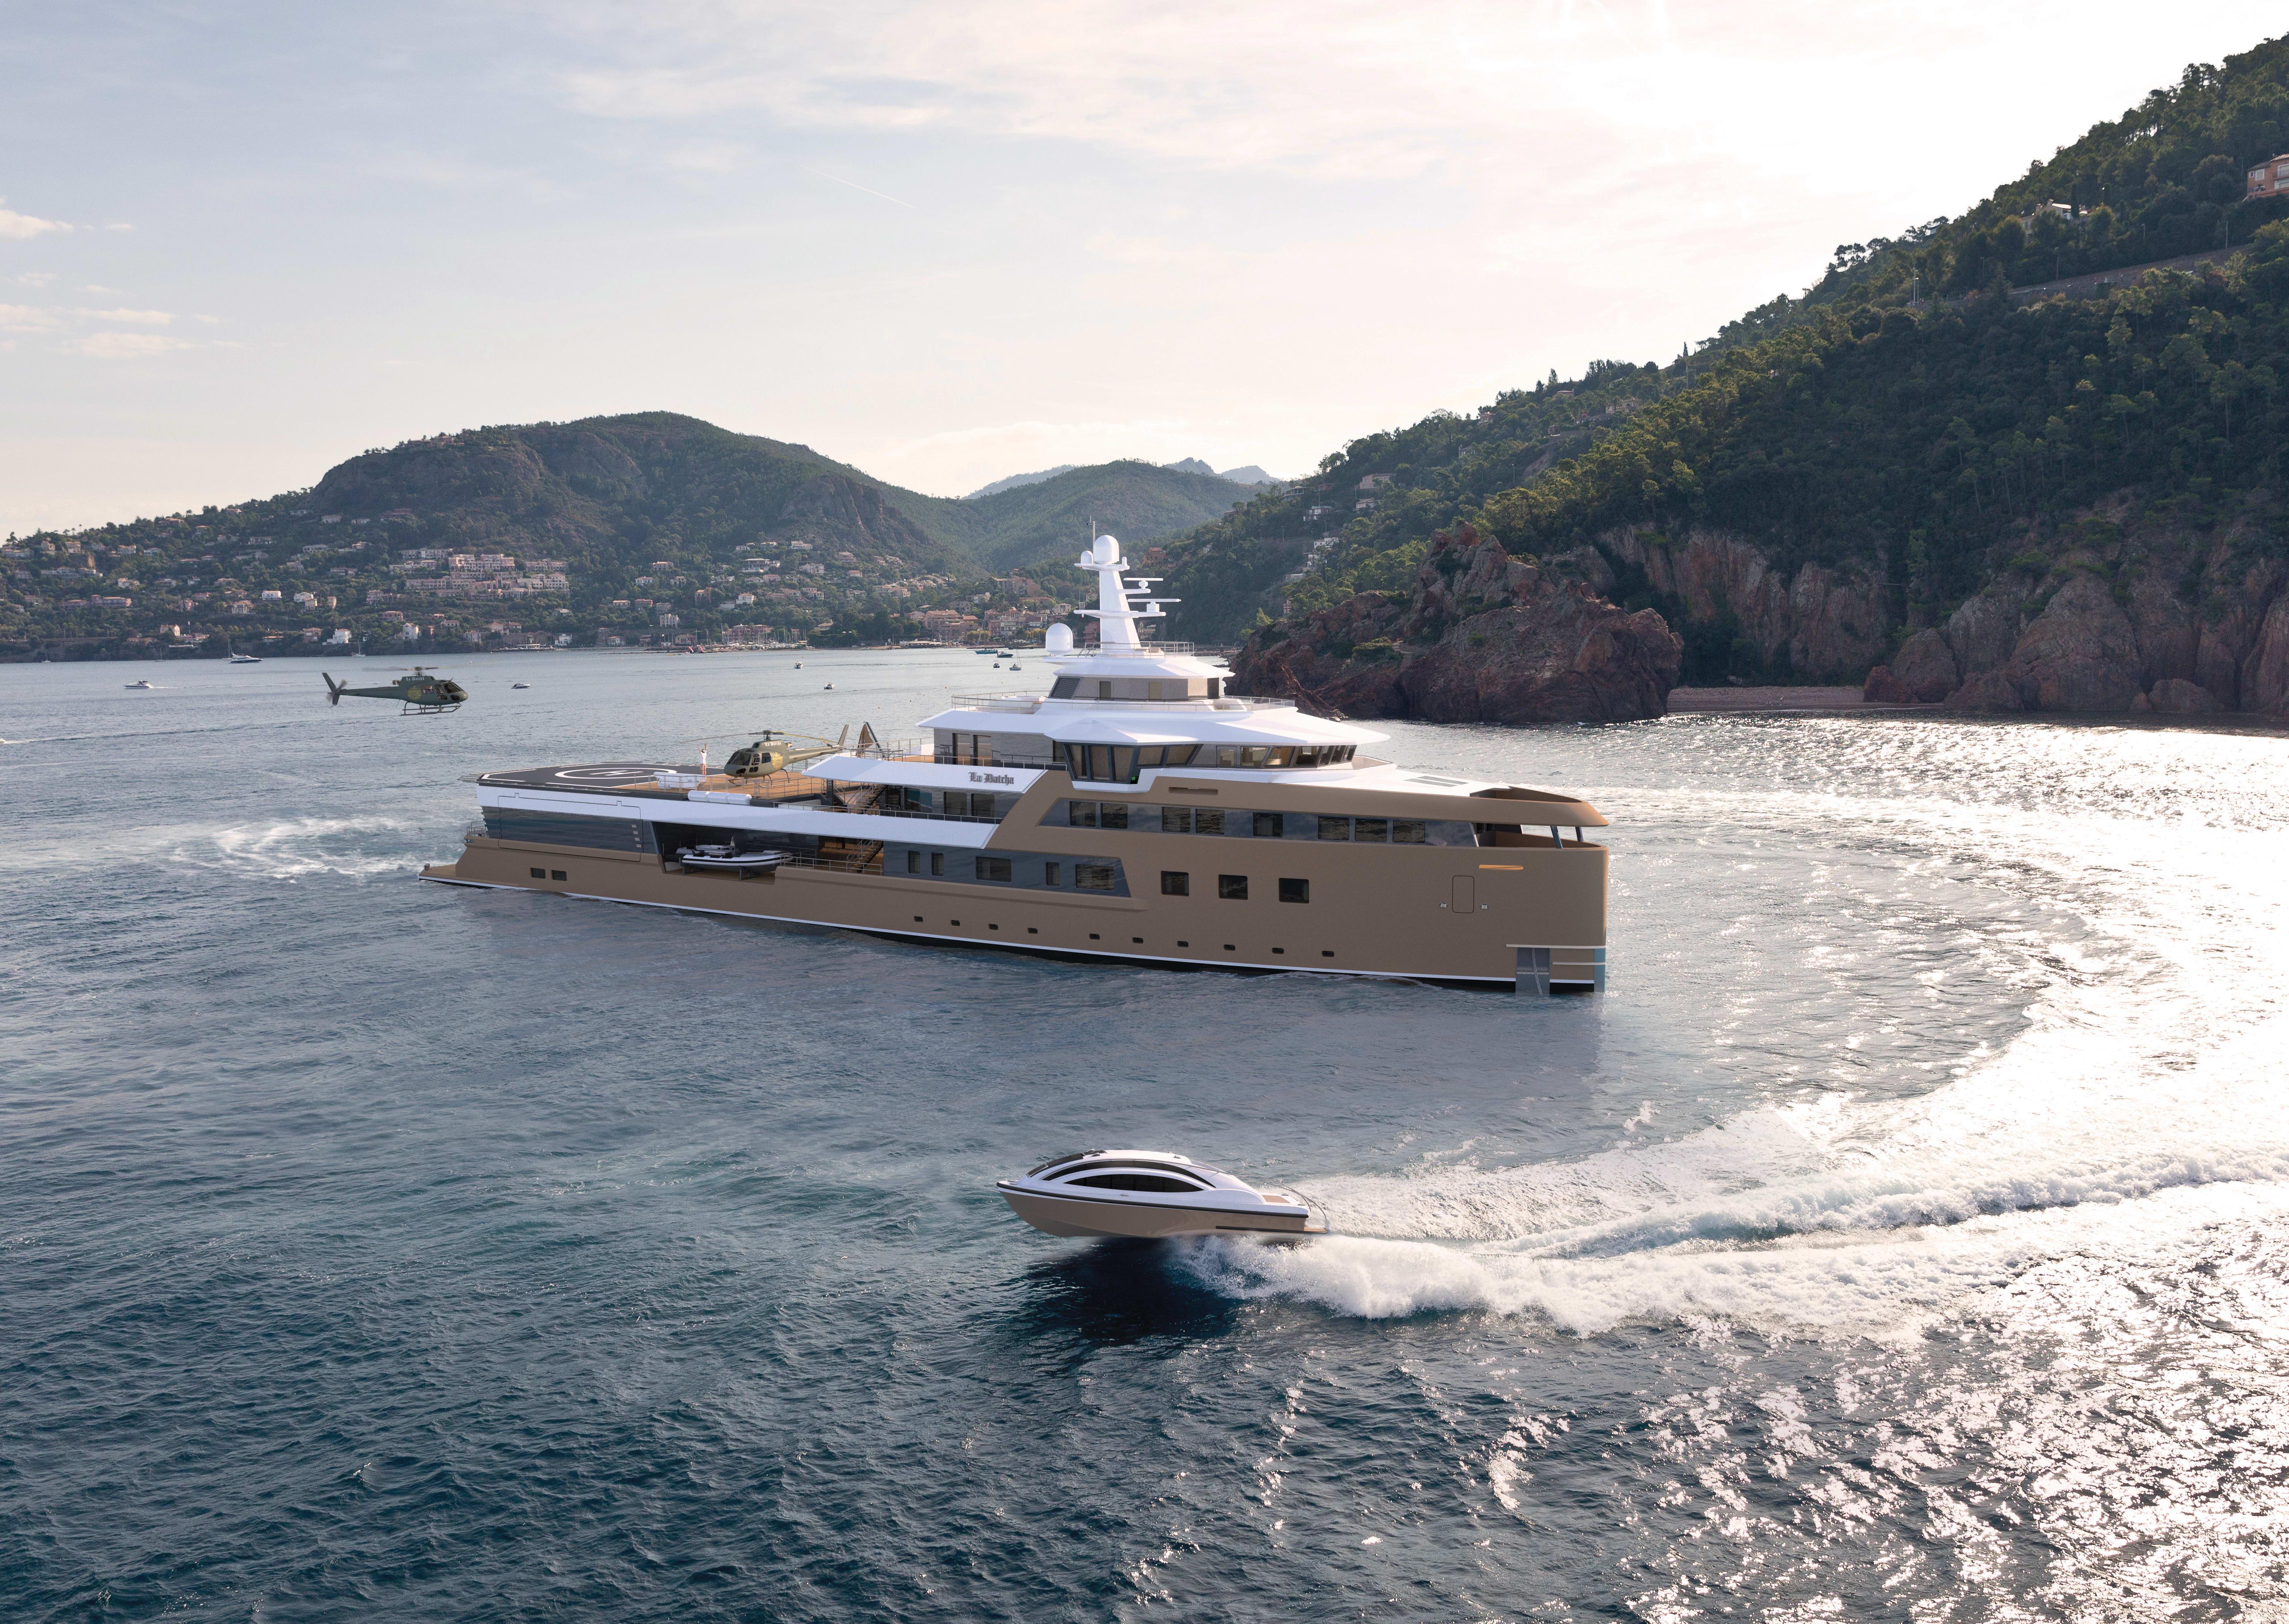 Image of La Datcha 77.0M (252.6FT) motor yacht